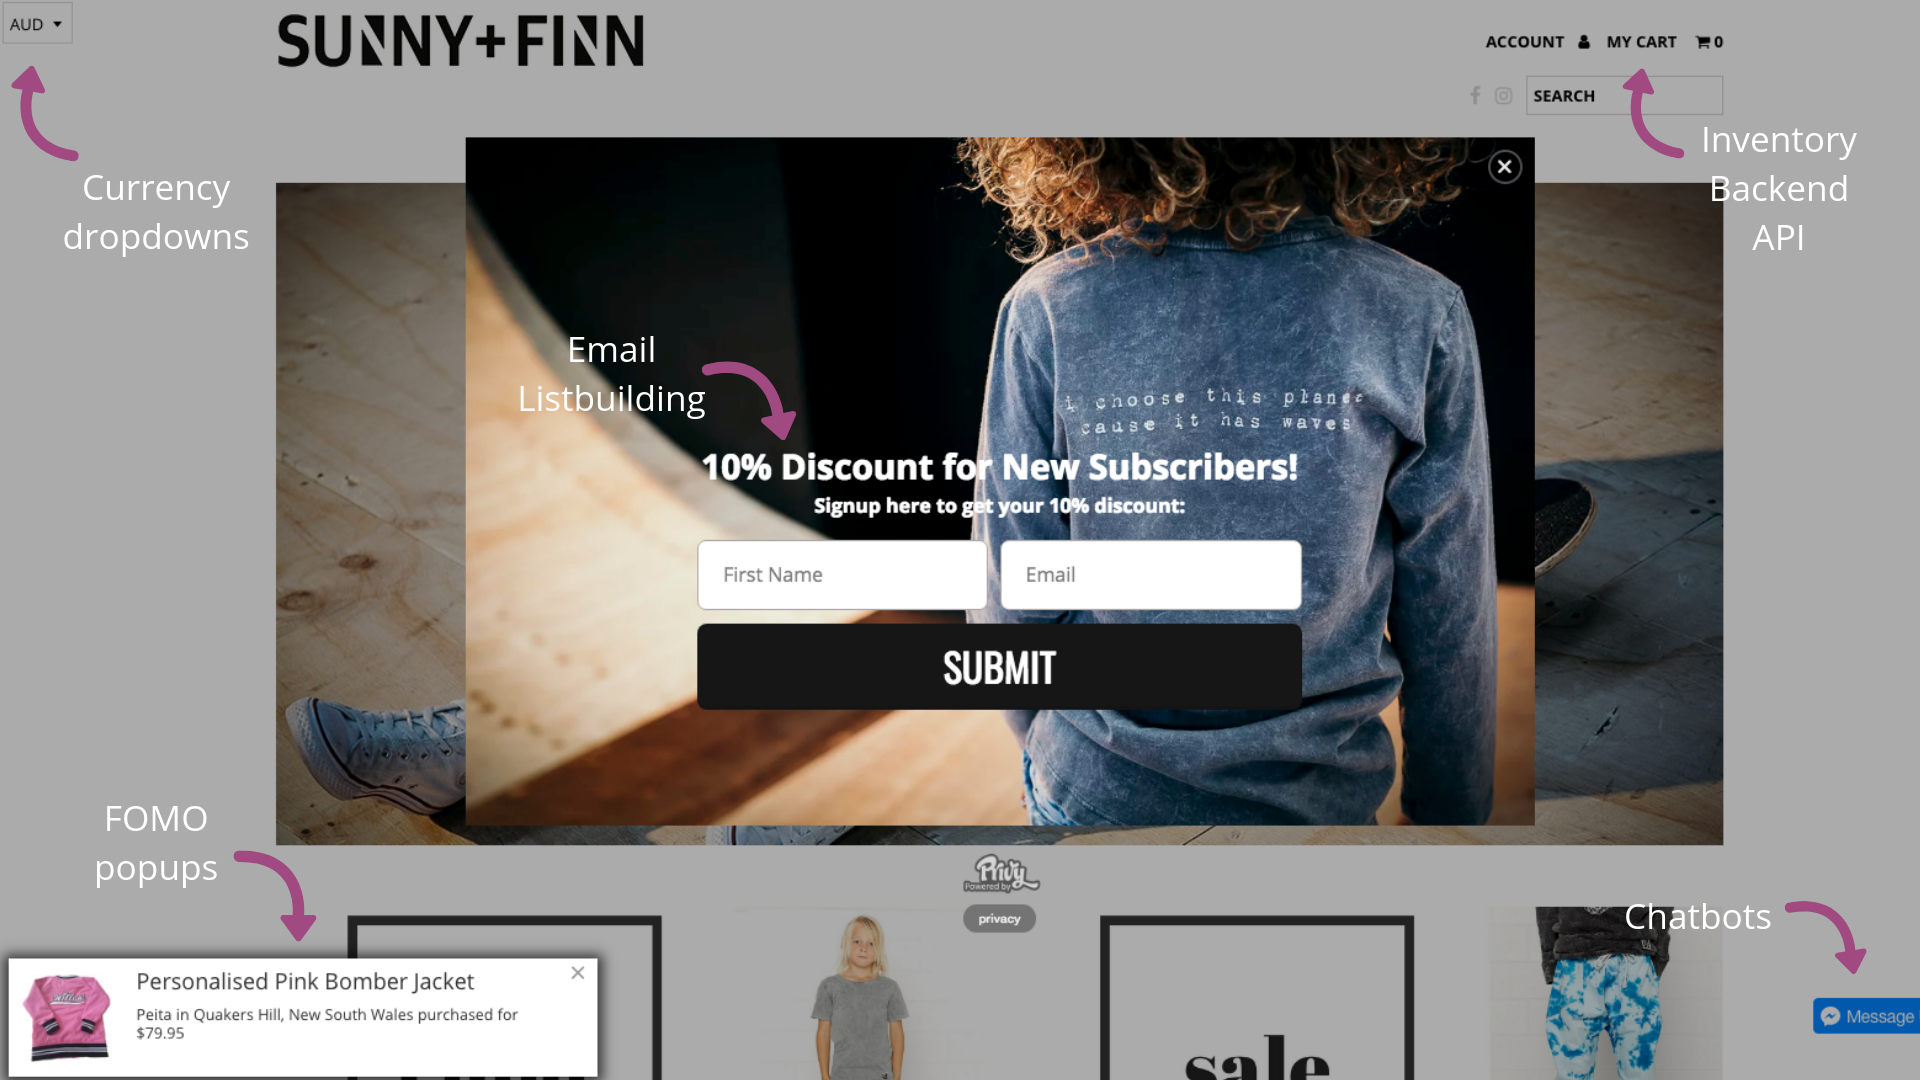 e-commerce website optimized for sales